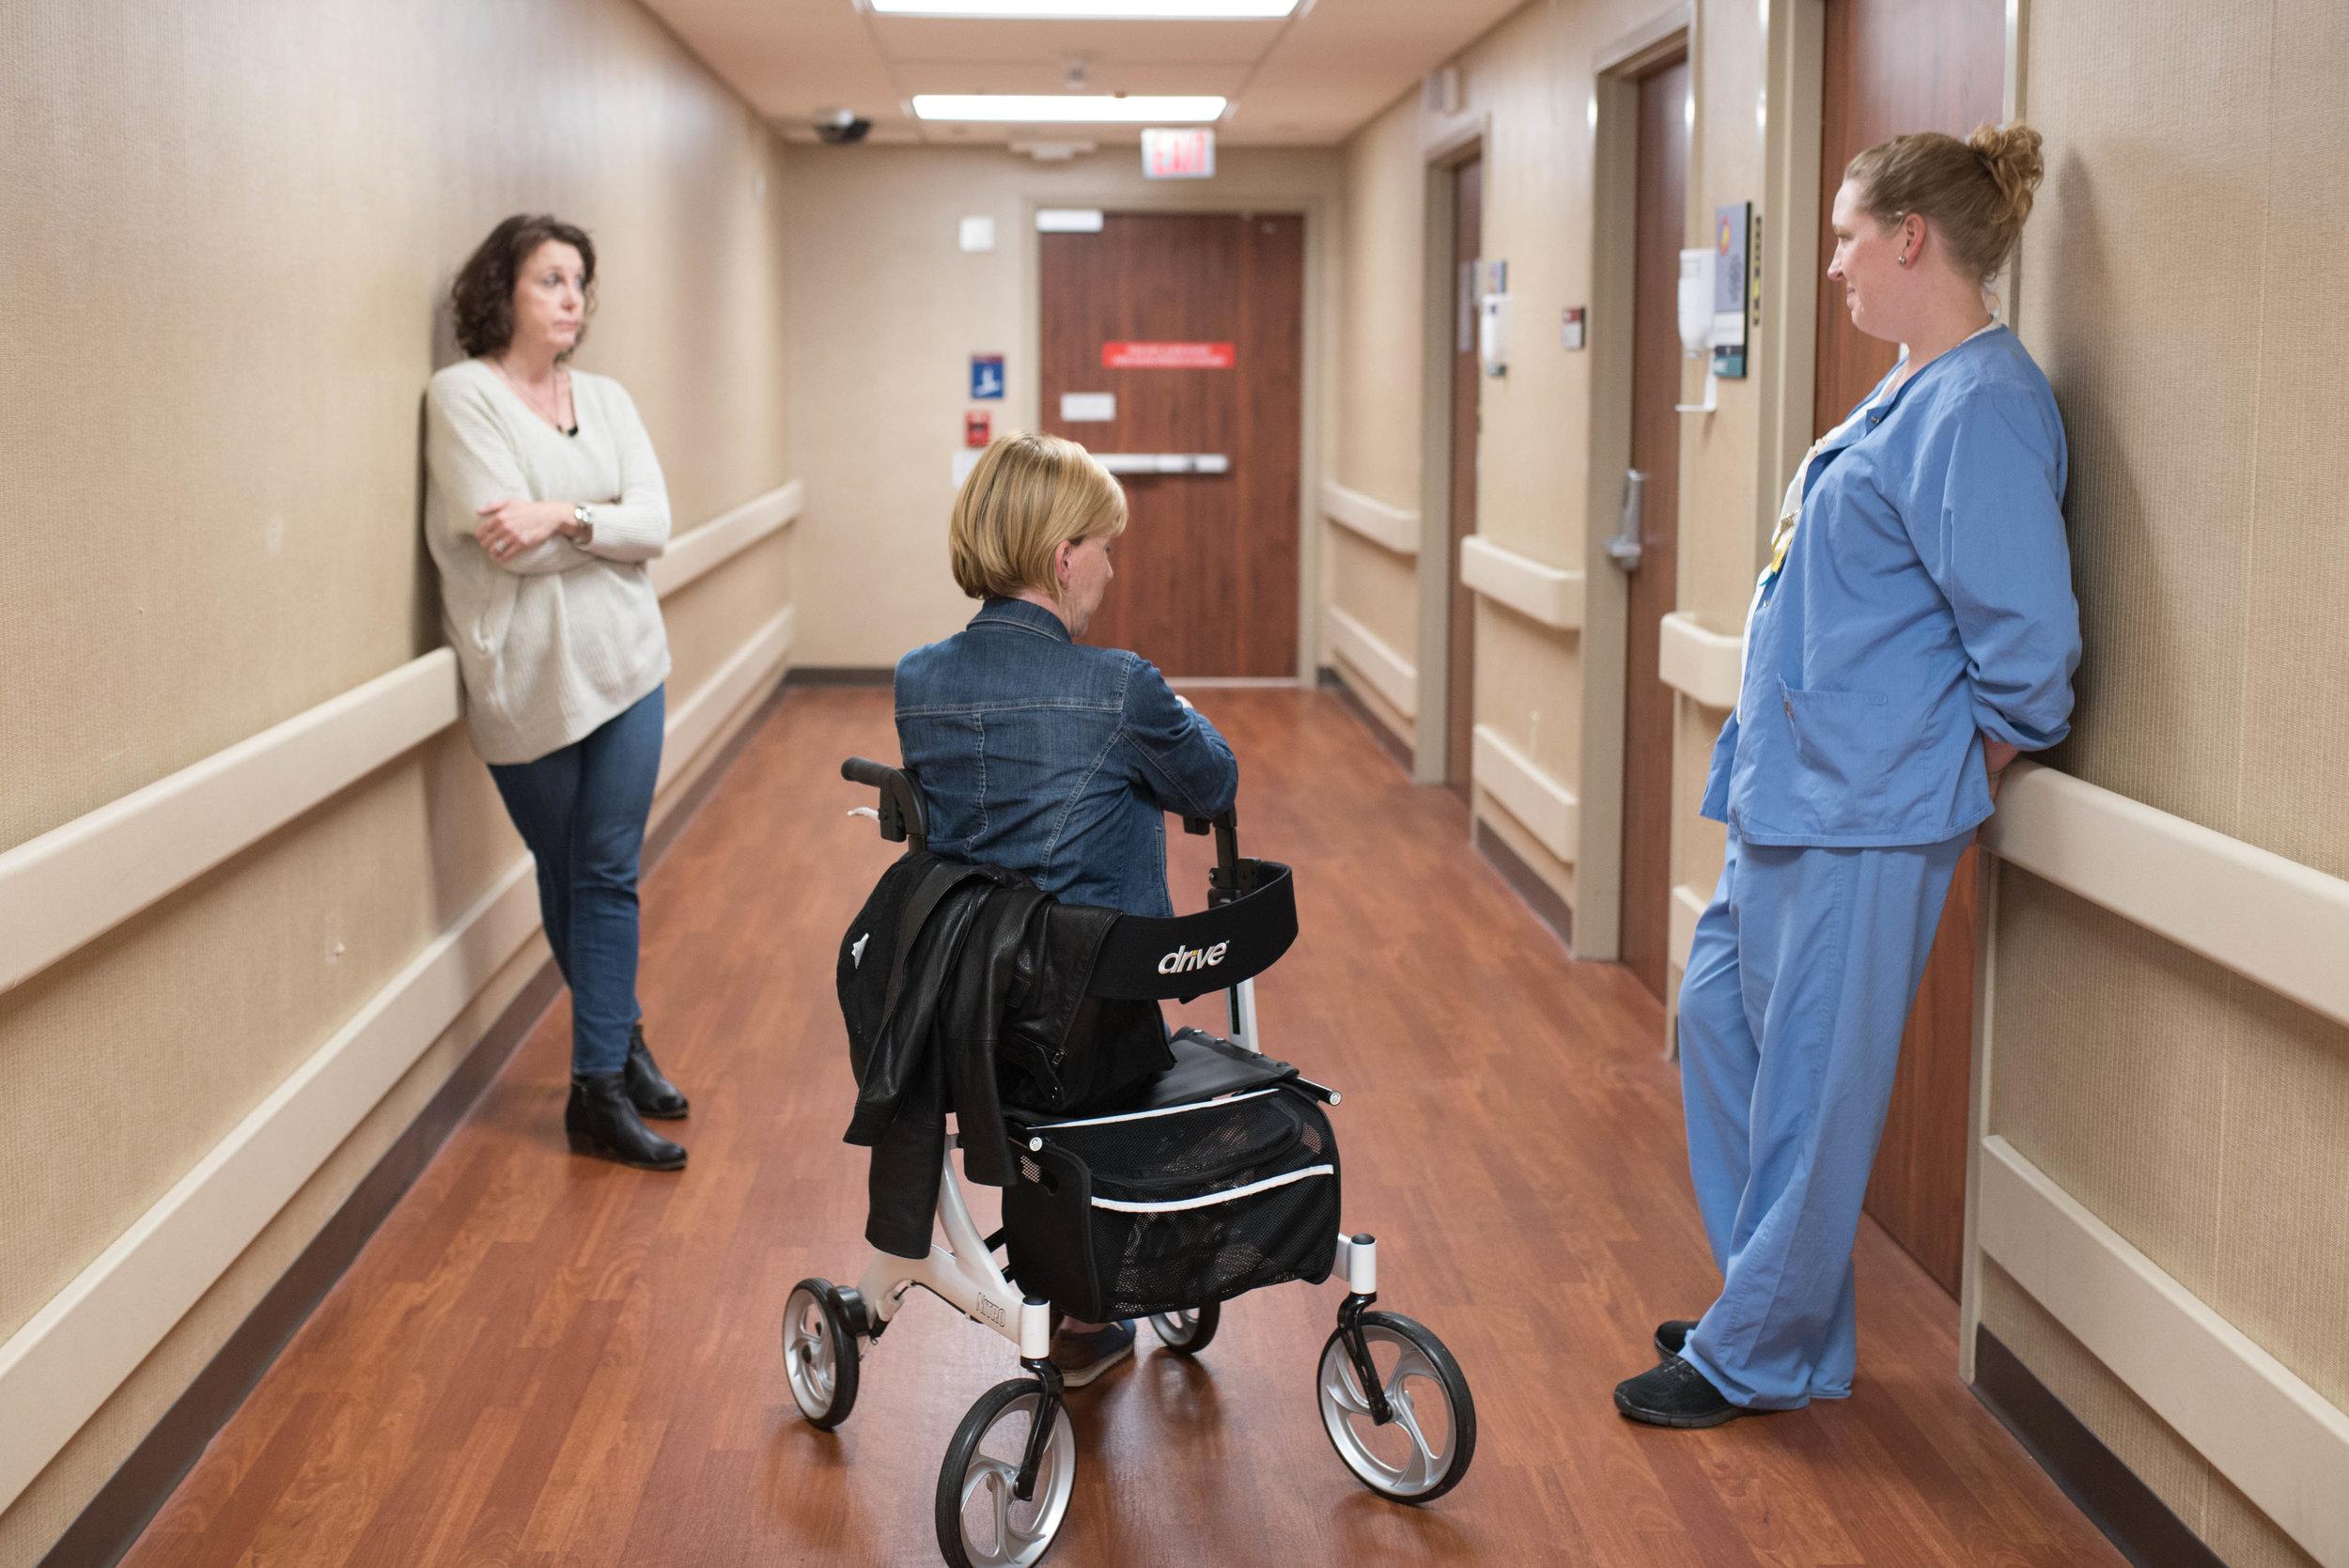 056-Full-Circle-st-vincents-southside-hospital-birth-jacksonville.jpg